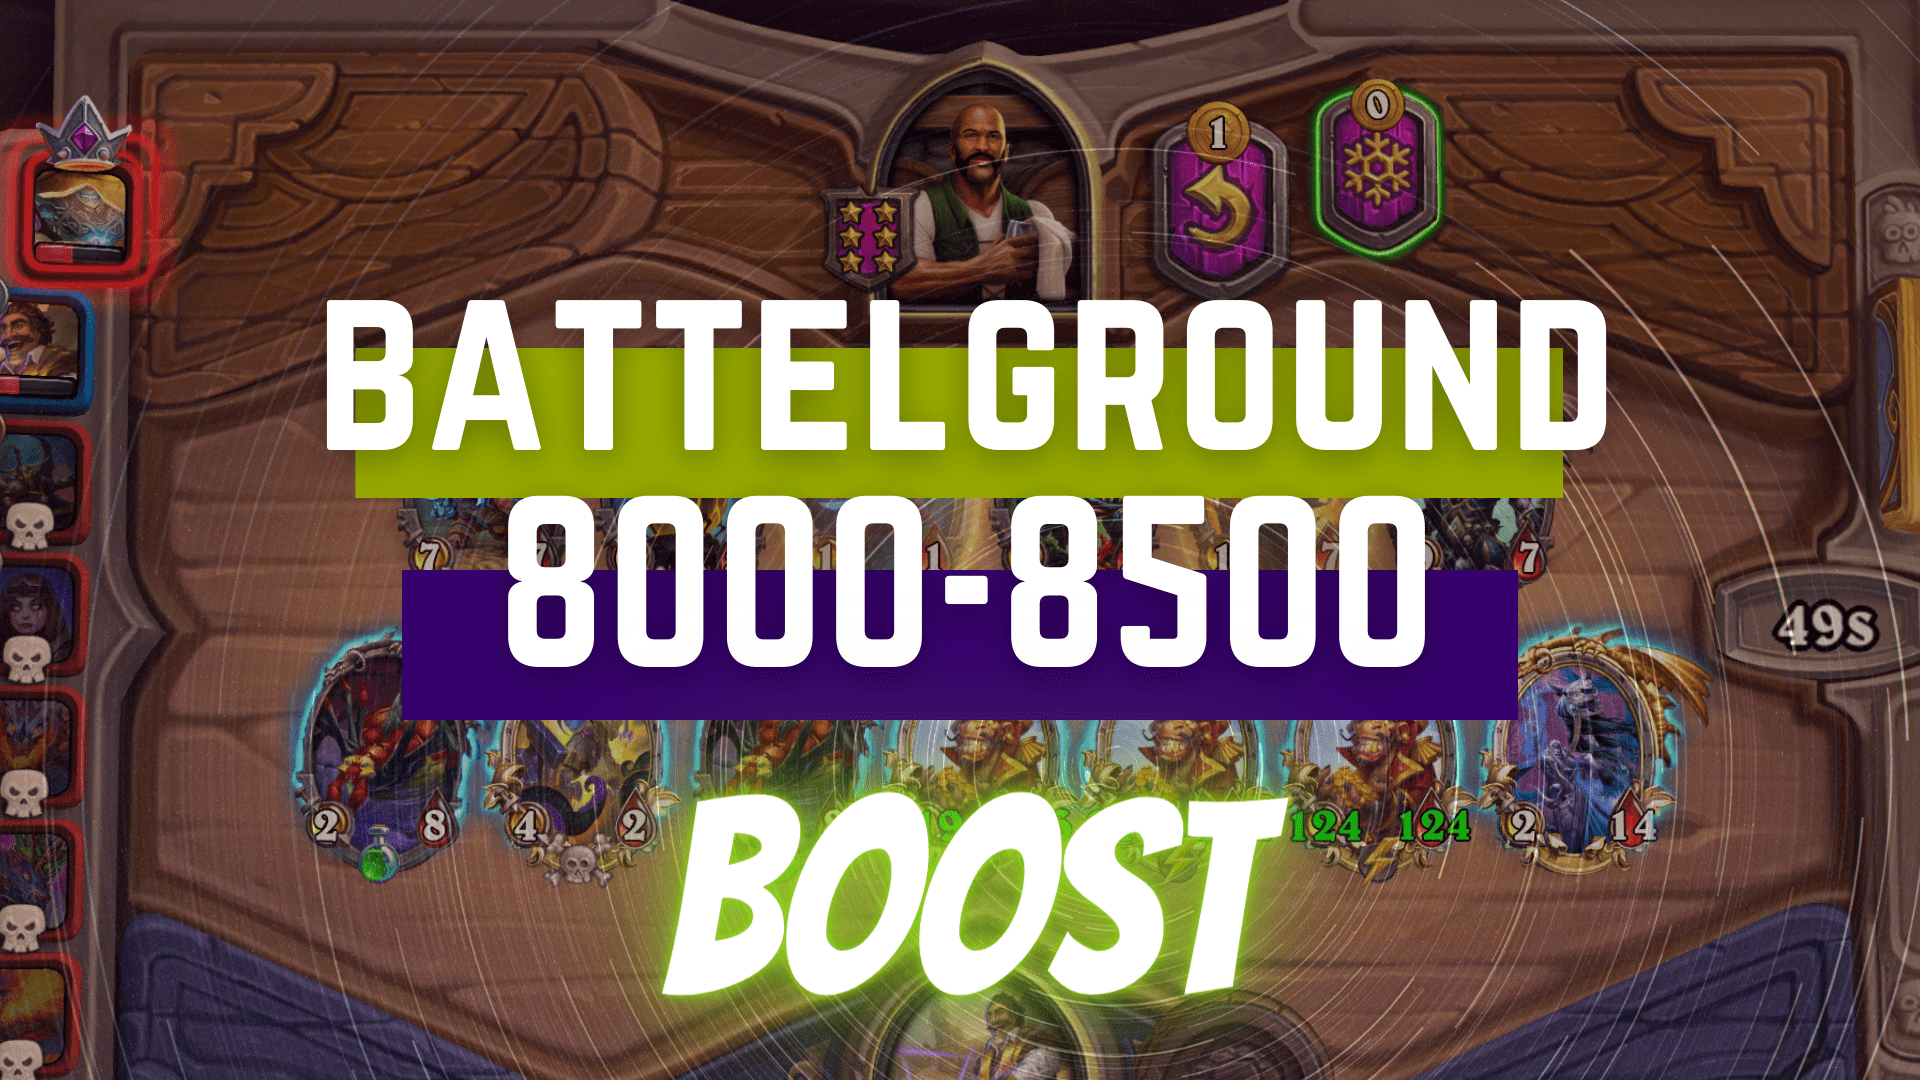 [BATTLEGROUNDS RATING] BOOST FROM 8000 TO 8500 Zafari - e2p.com